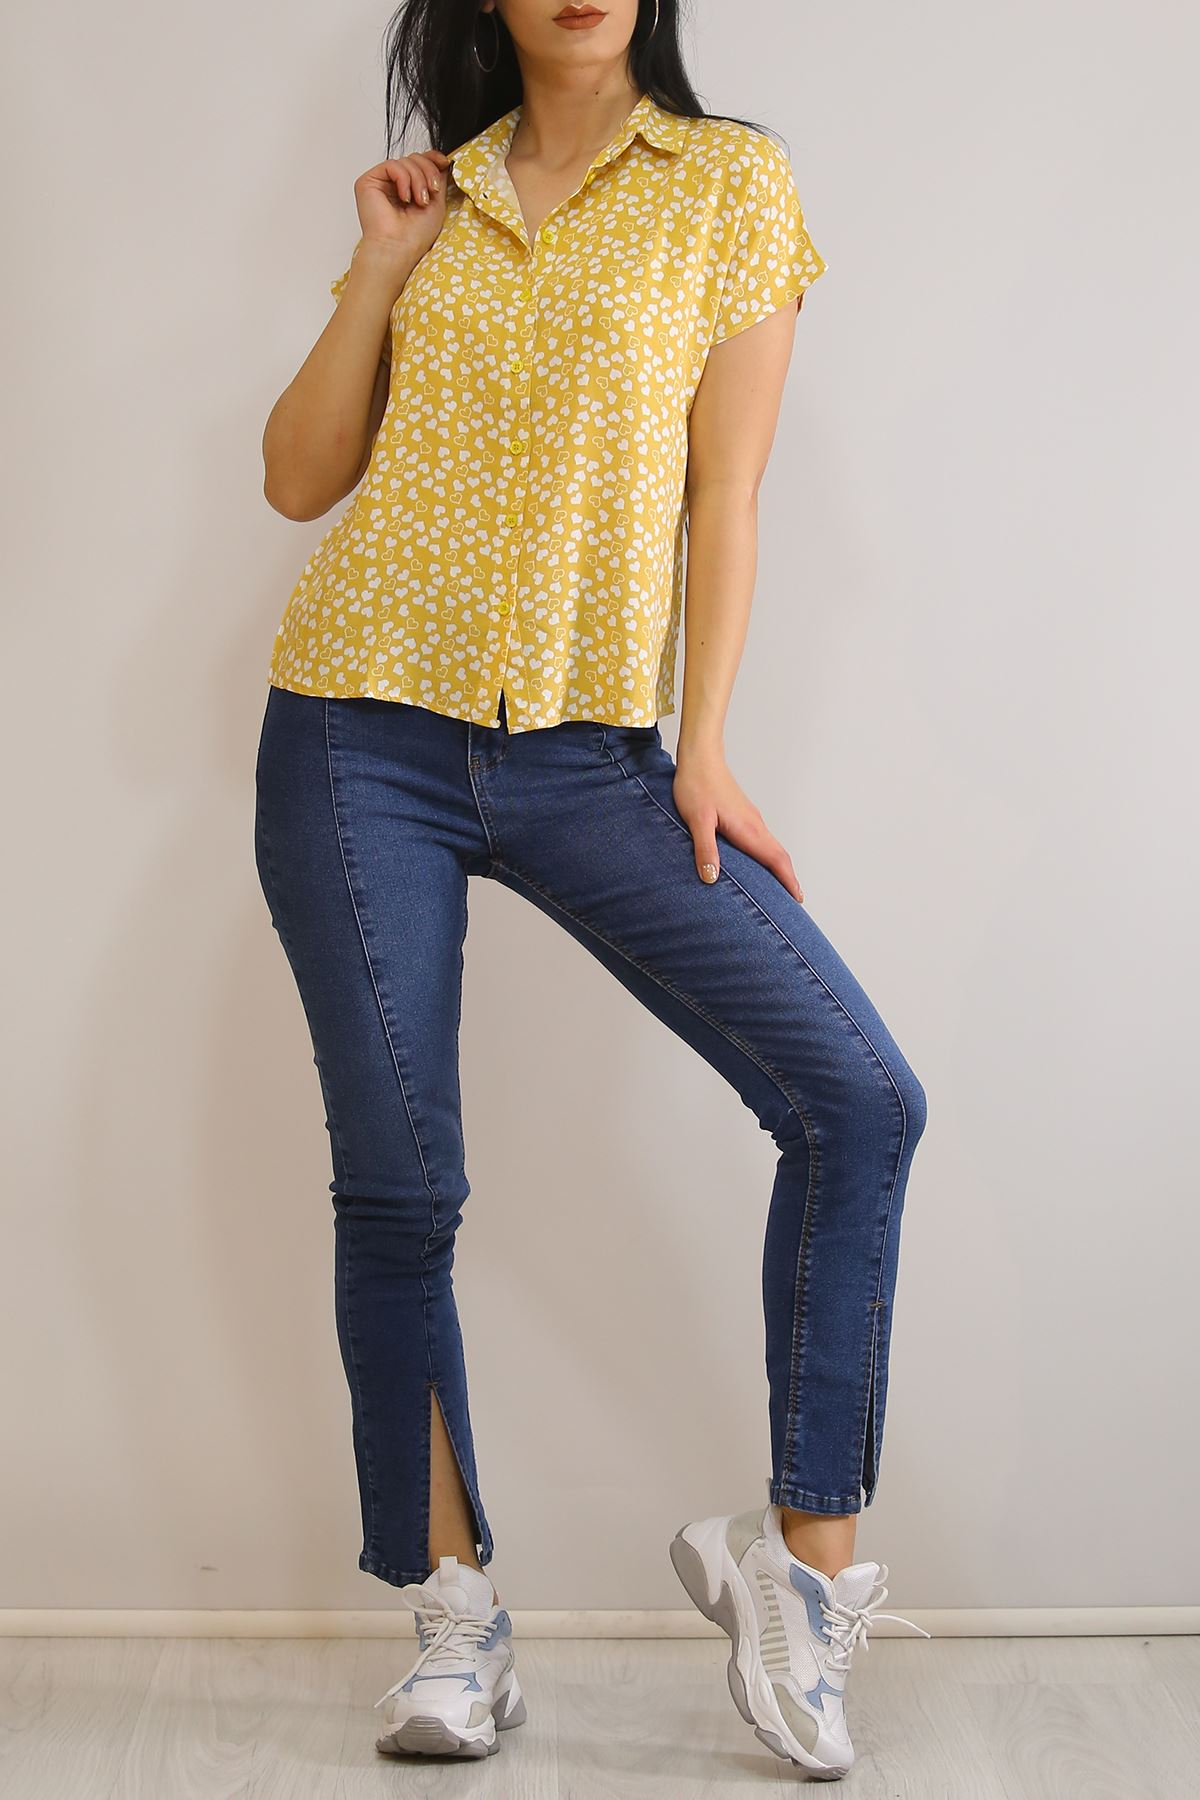 Yarasa Kol Gömlek Sarı - 1546.1095.